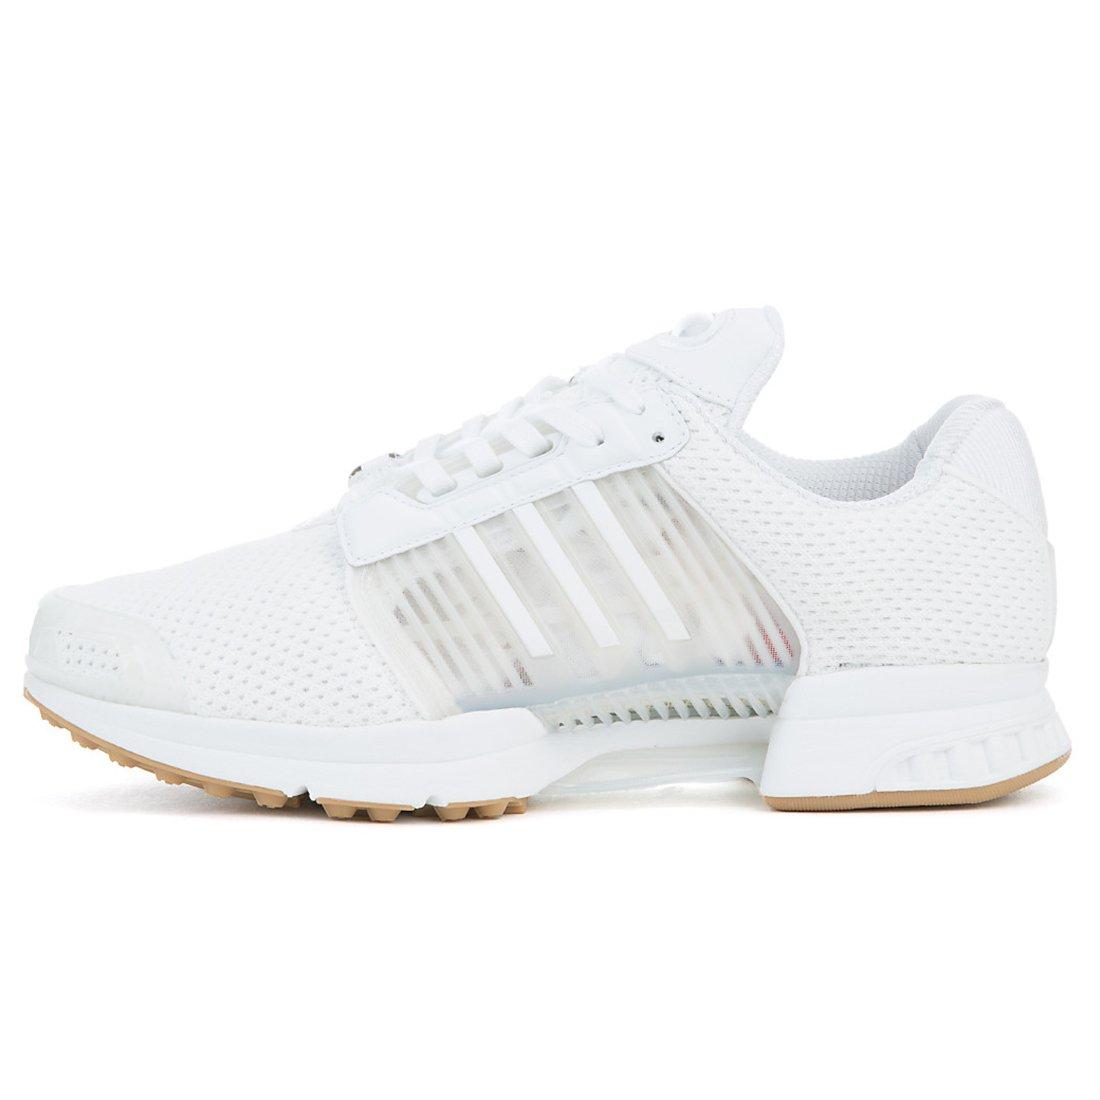 Galleon Adidas Men's Climacool 1 Running Shoe White 11.5